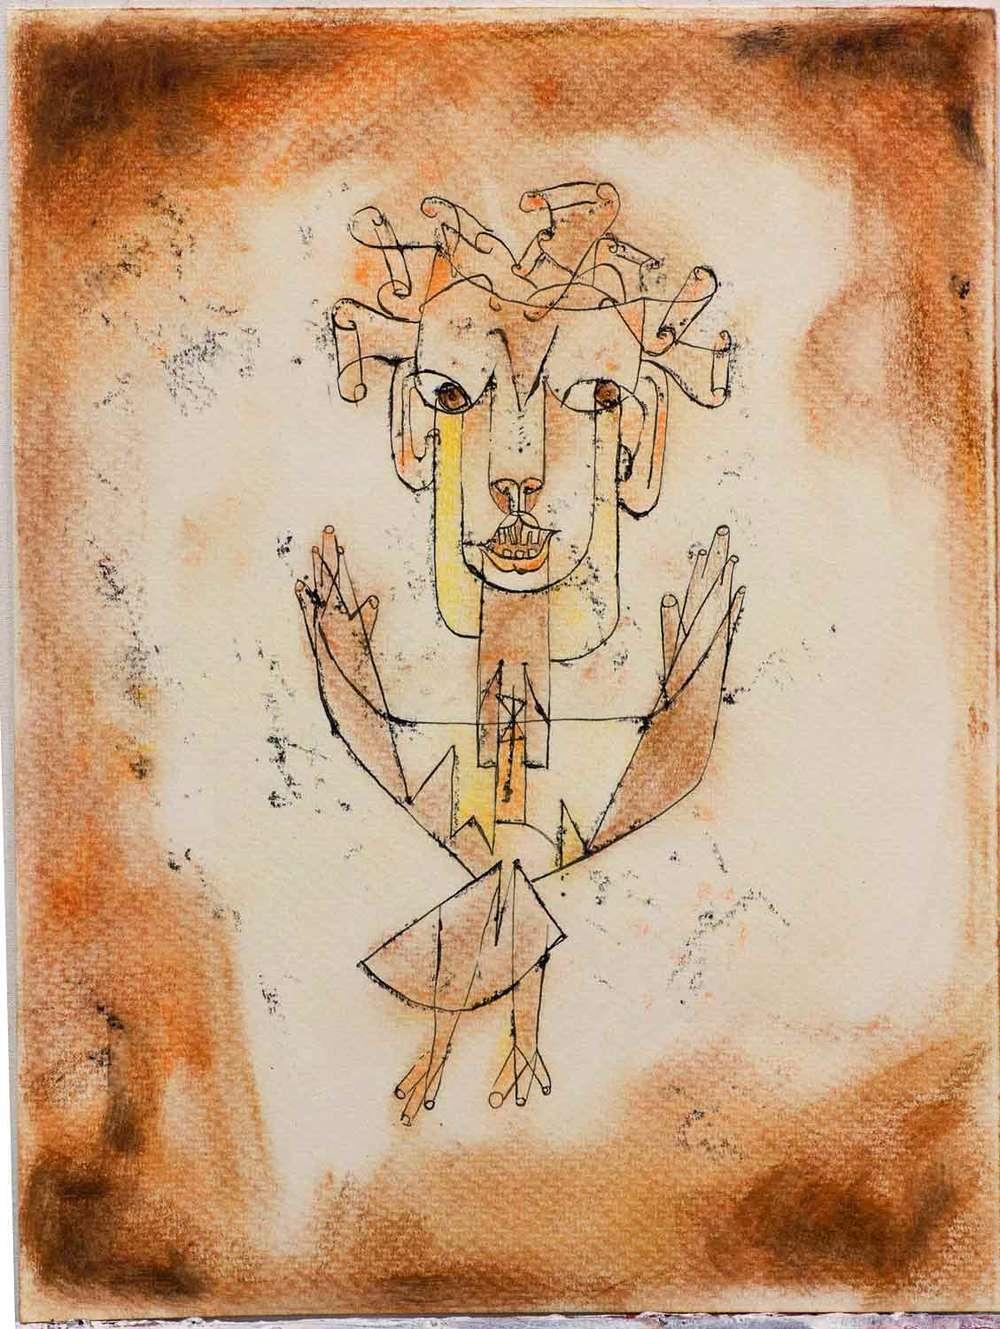 Paul Klee's Angelus Novus